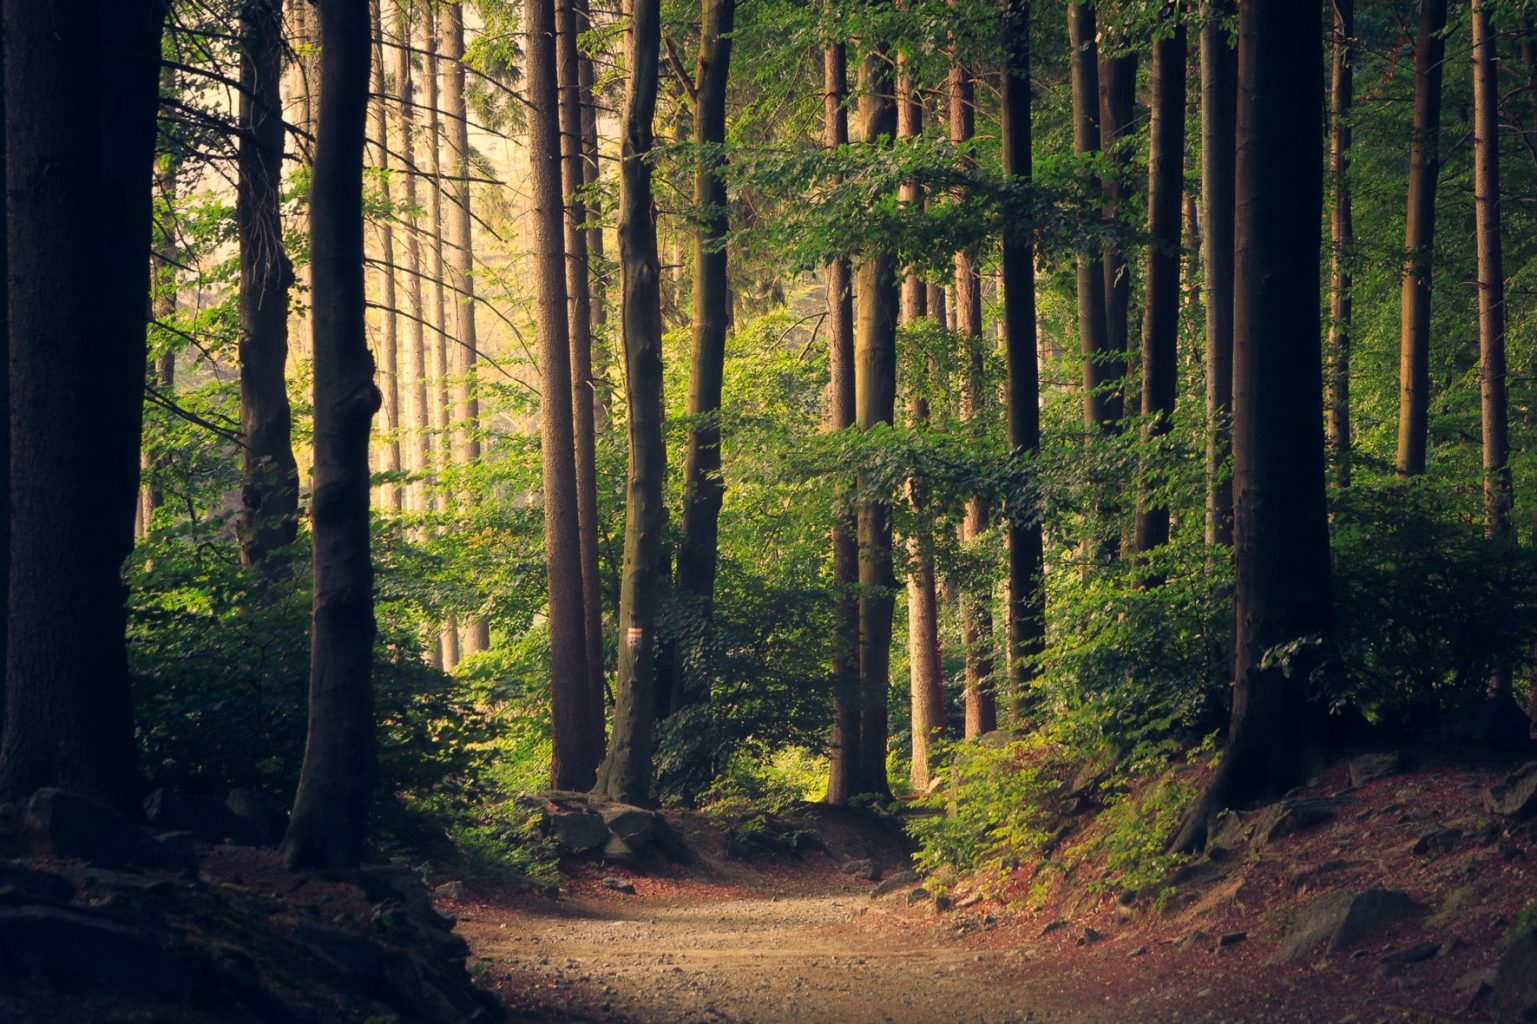 Image: Trees